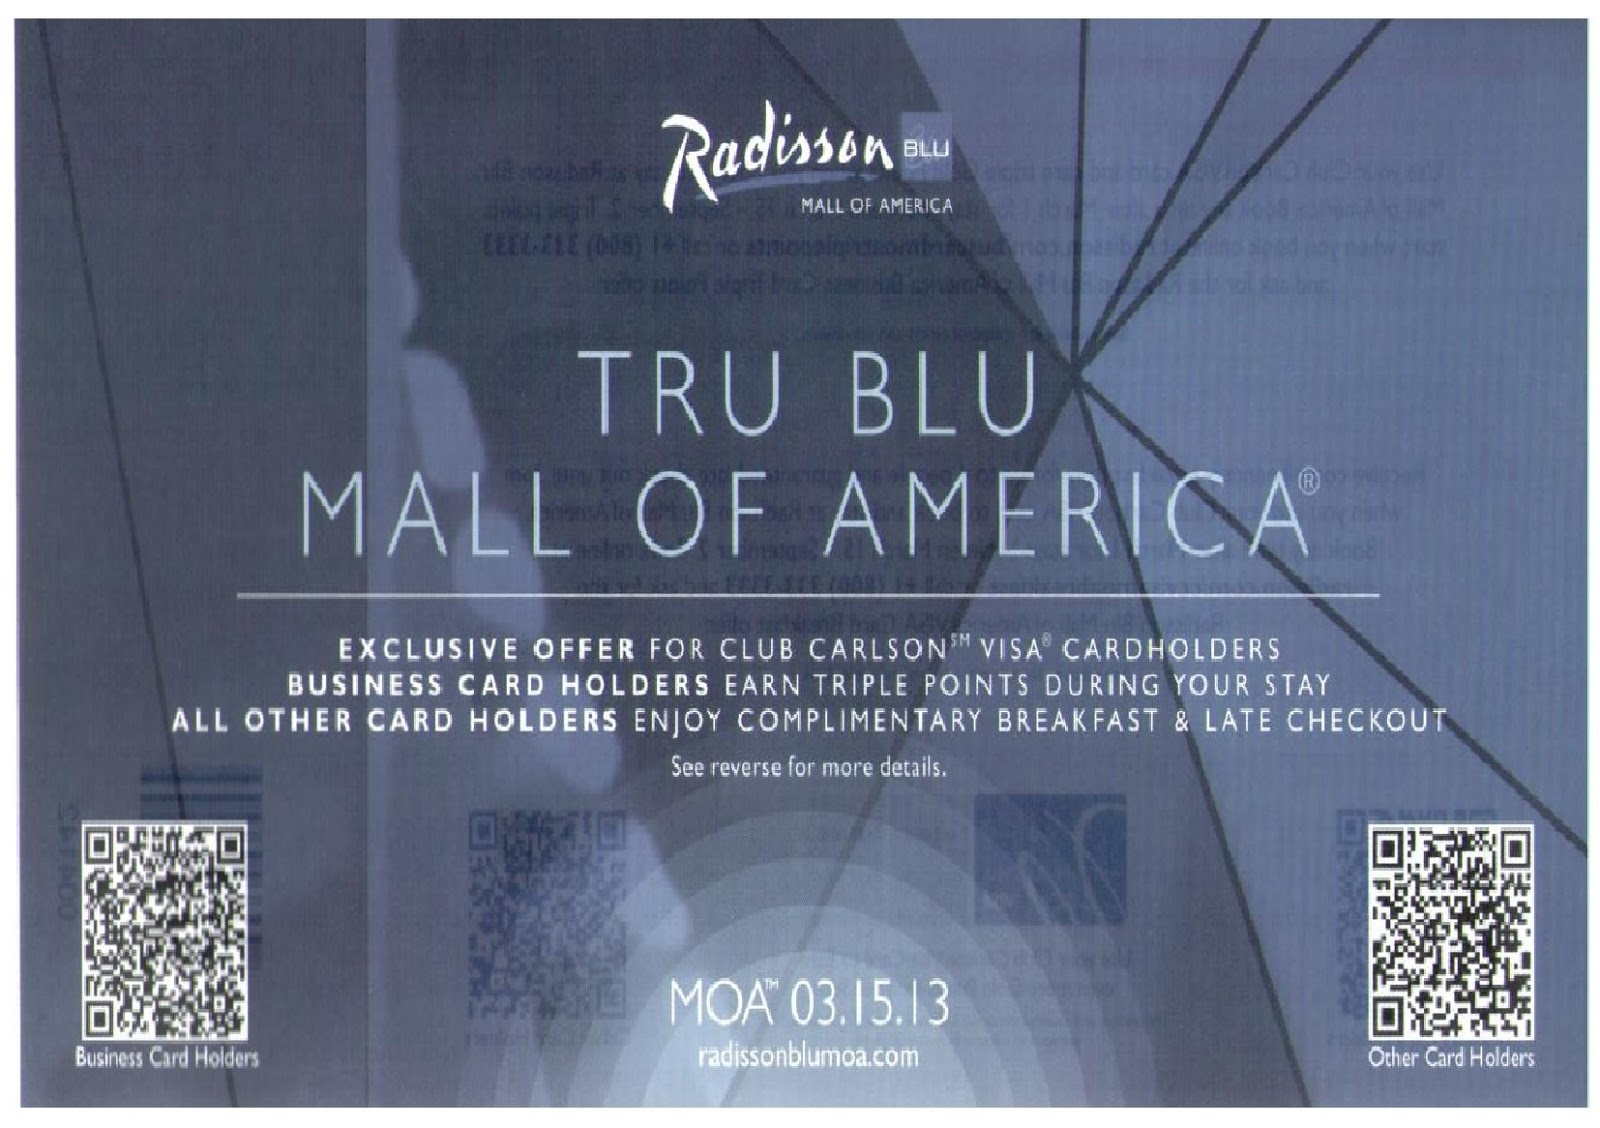 Radisson Blu Mall of America Offer